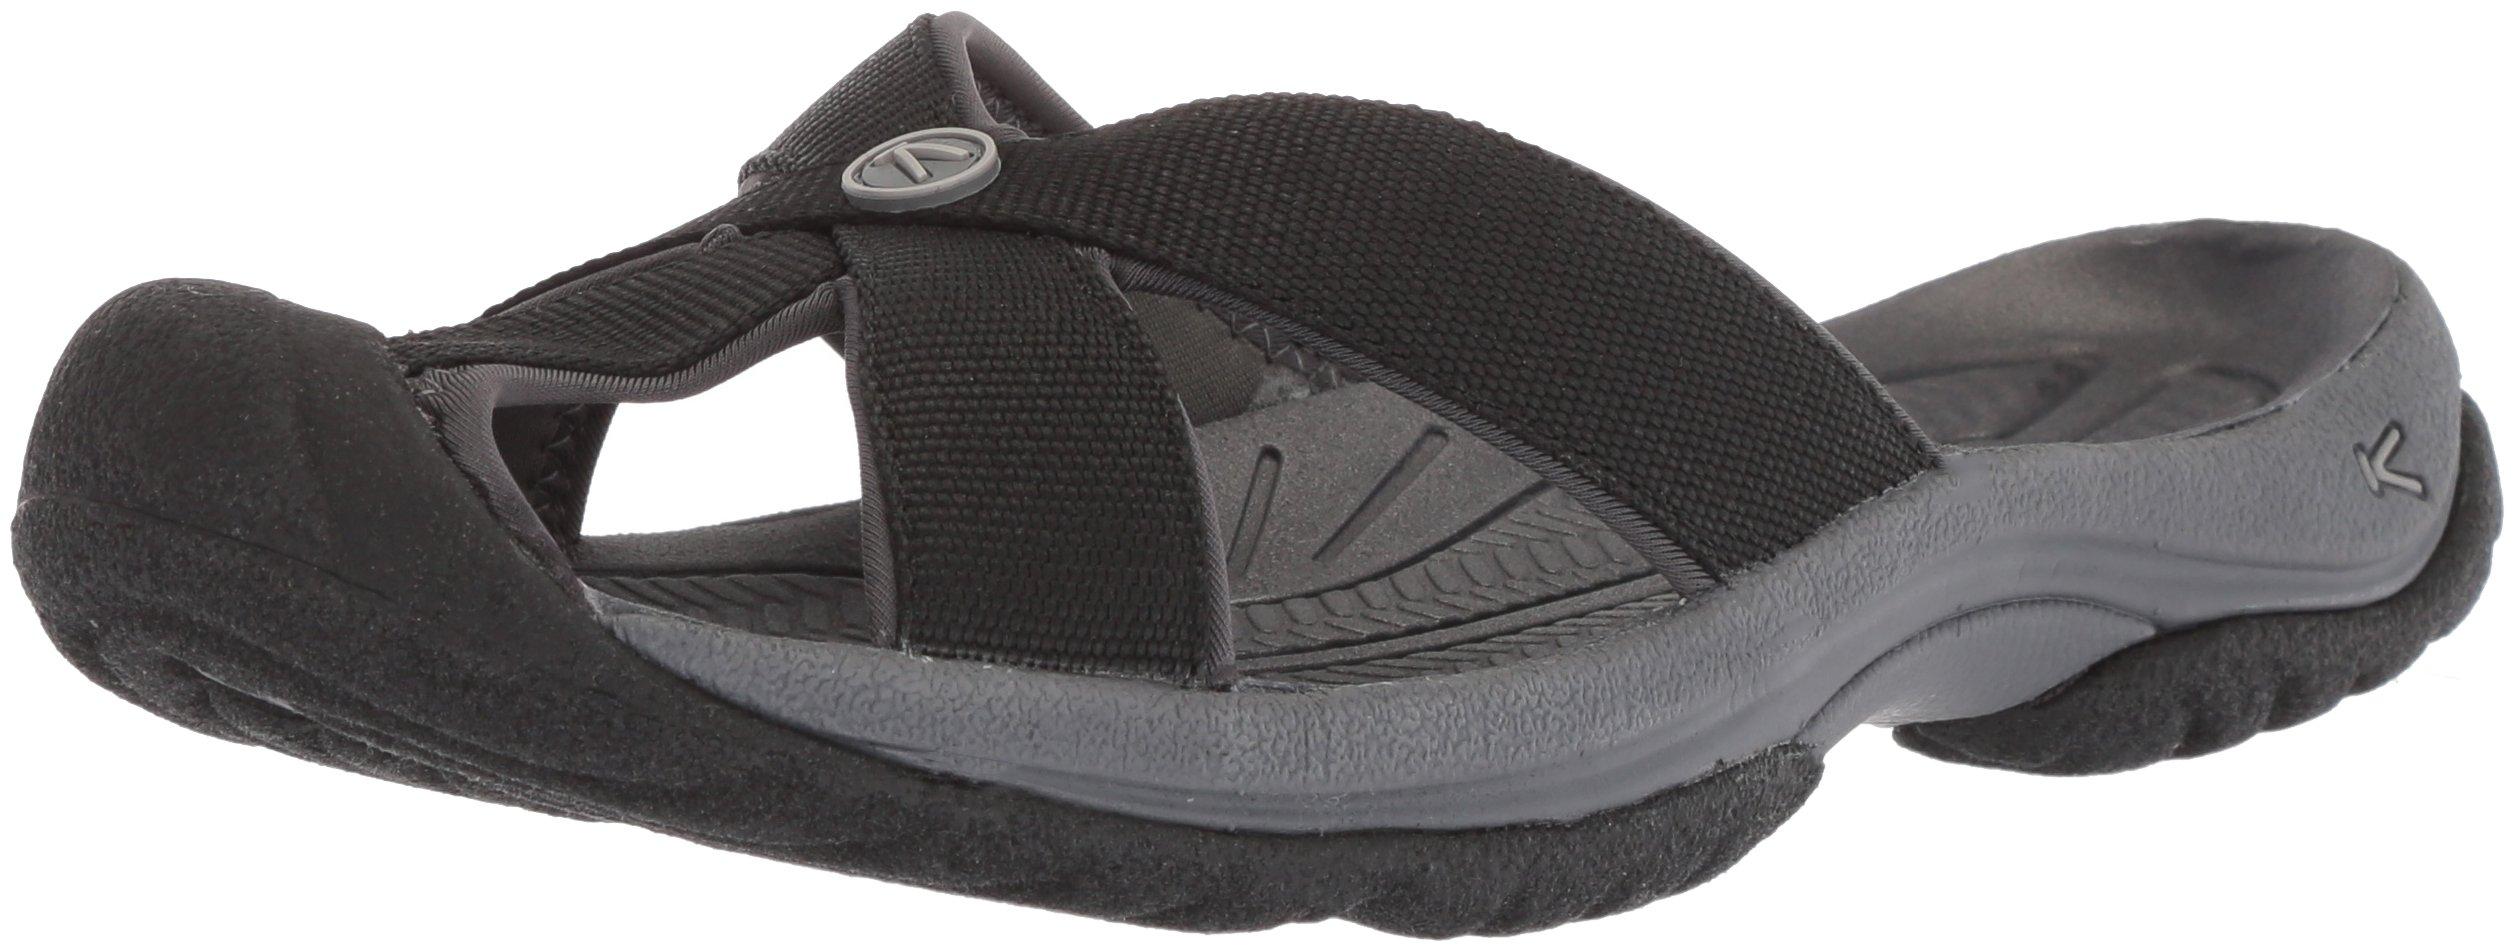 KEEN Women's Bali-W Sandal, Black/Magnet, 7 M US